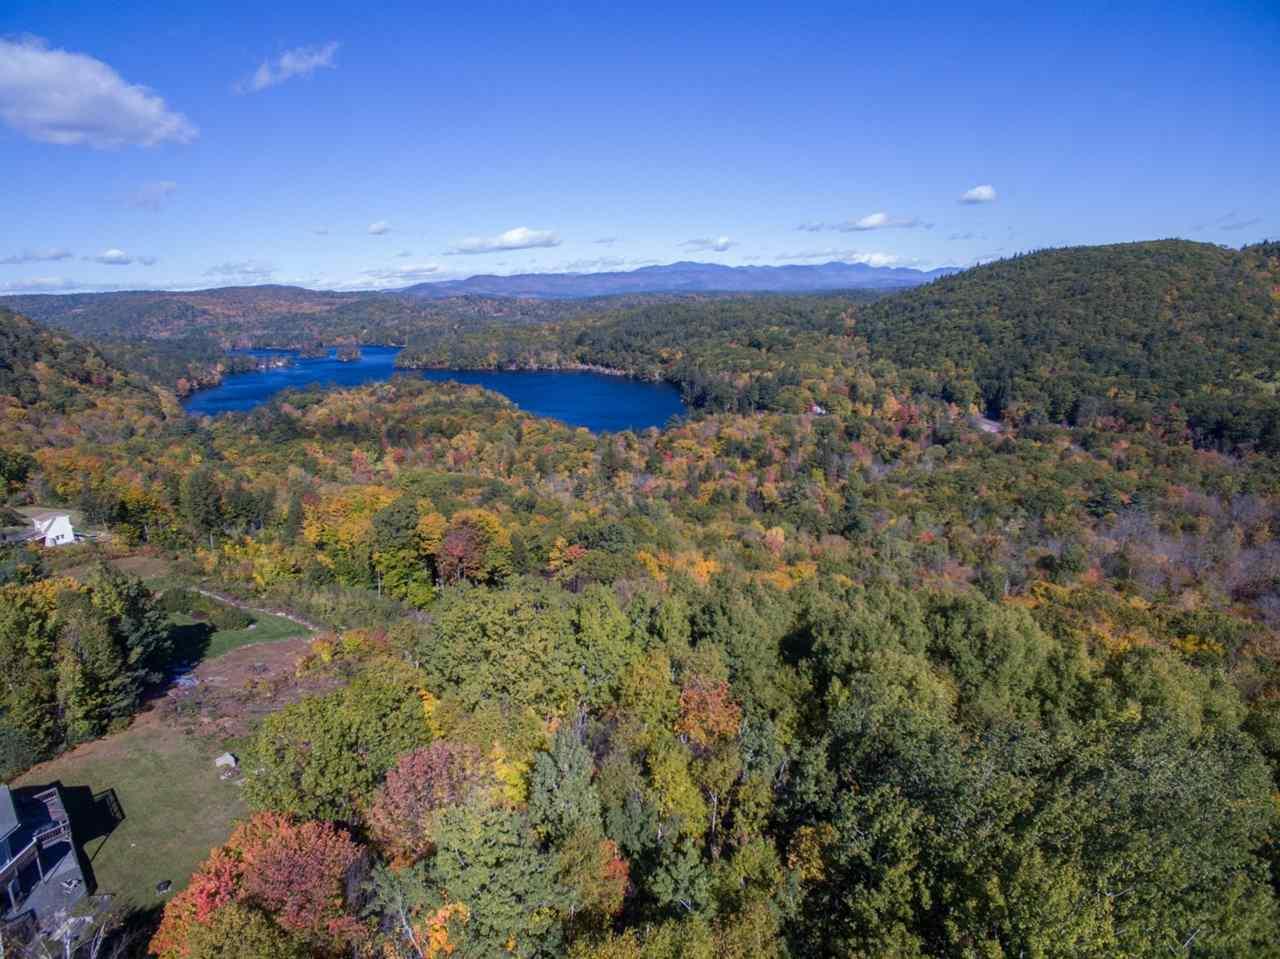 MLS 4724638: 40 Lake View, New Hampton NH